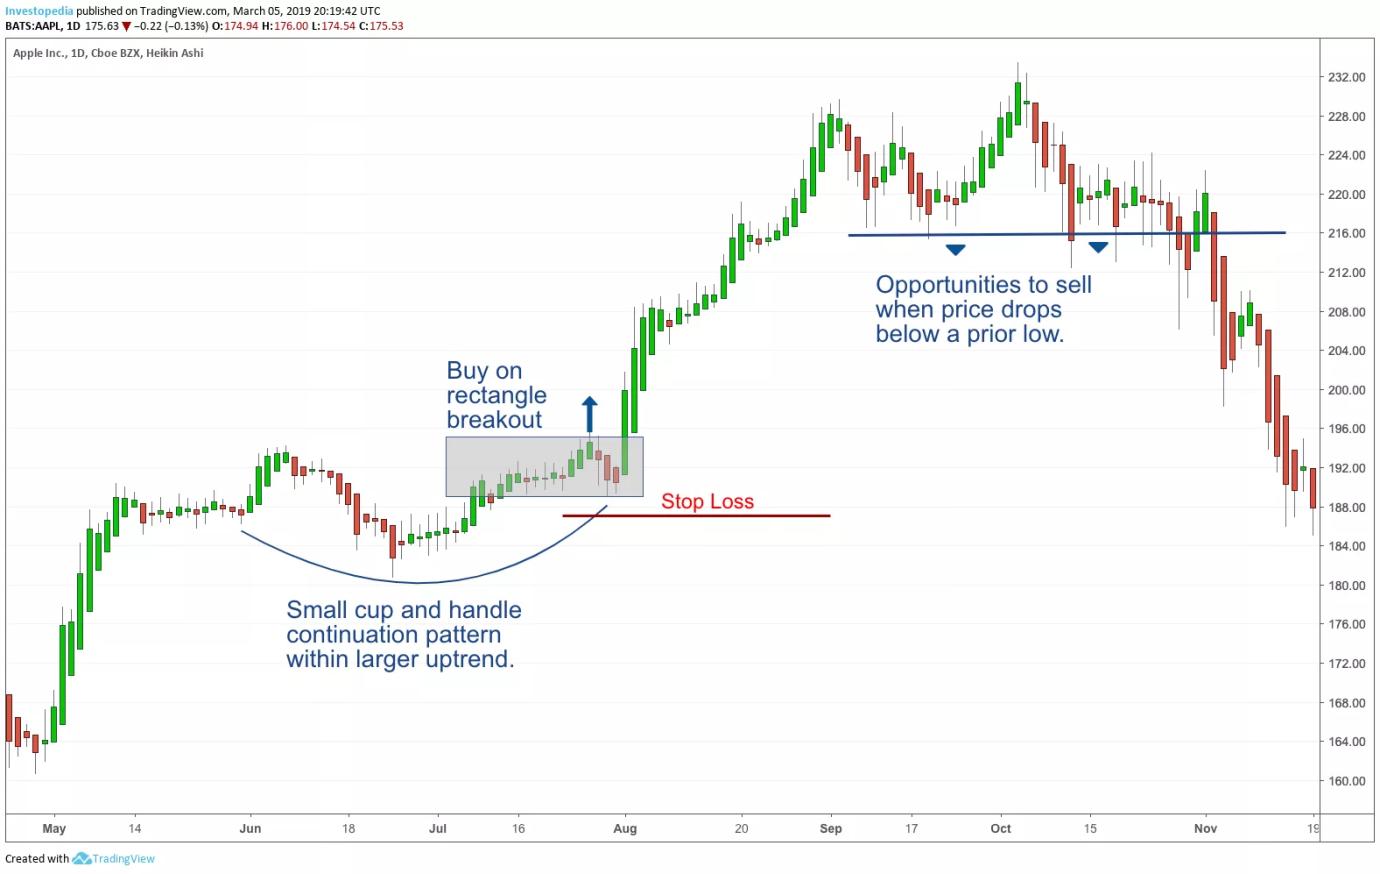 ¿Qué es Swing Trading para Dummies? Estrategias populares, ForexTrend